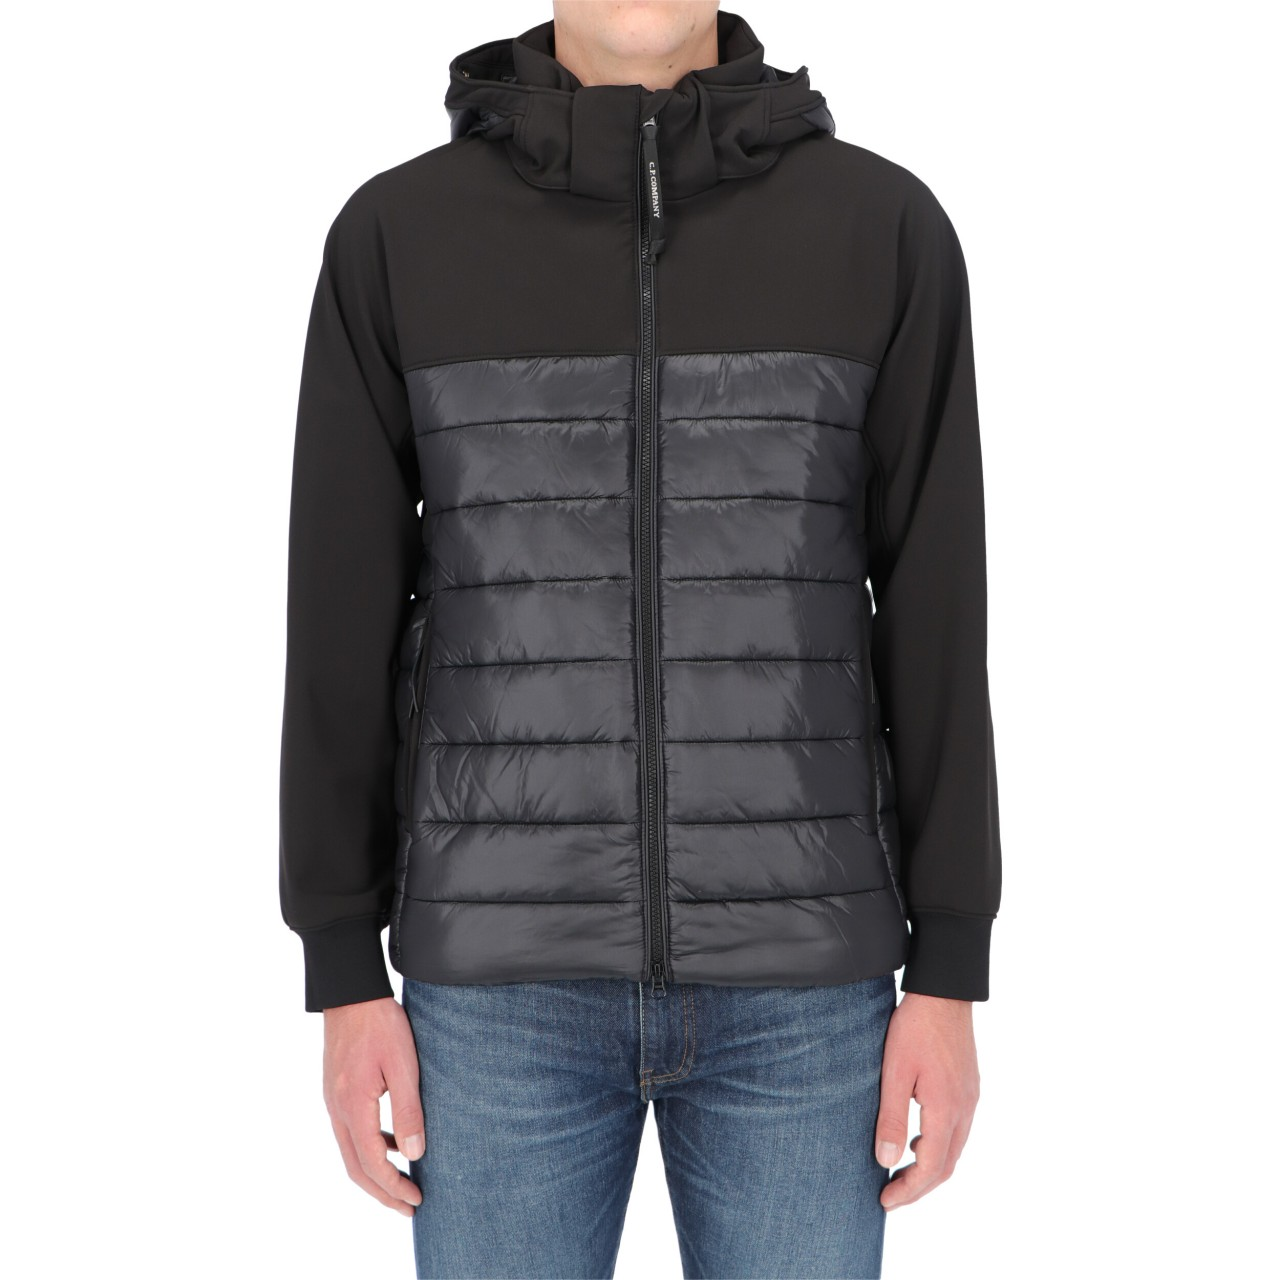 C.p. company Uomo Giacca C.P. Company Uomo Google Jacket Outerwear 048O